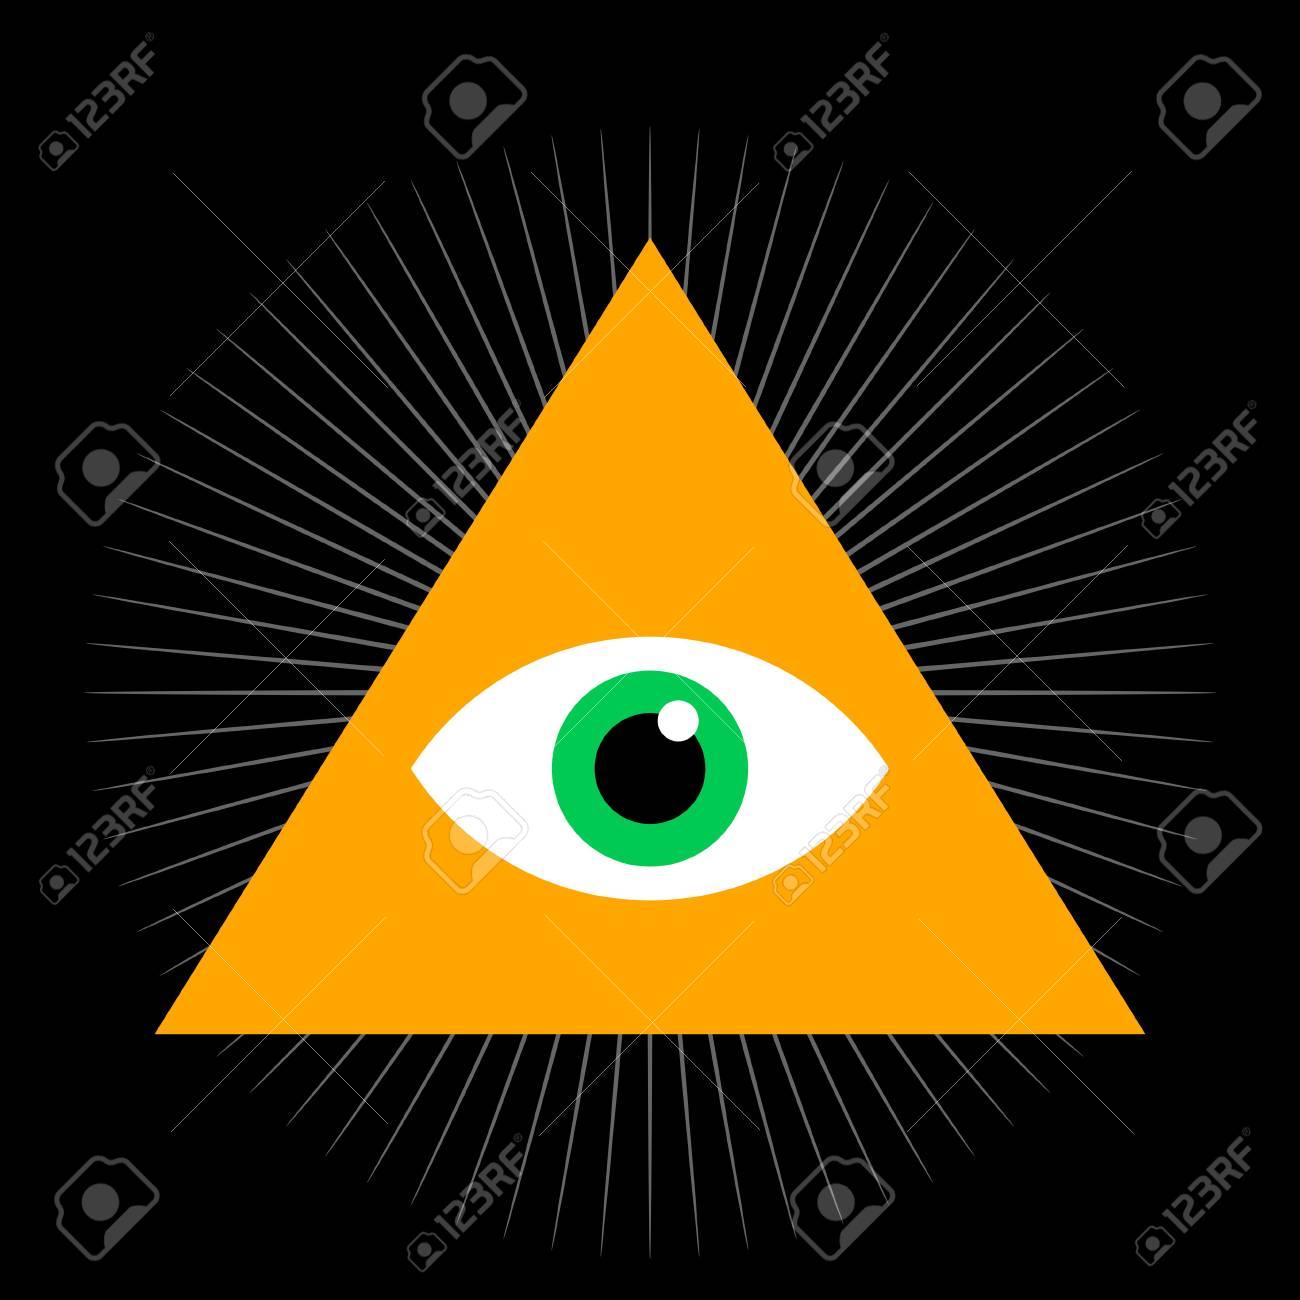 Seeing eye all seeing eye inside triangle pyramid vector all seeing eye inside triangle pyramid vector illustration masonic symbol buycottarizona Image collections